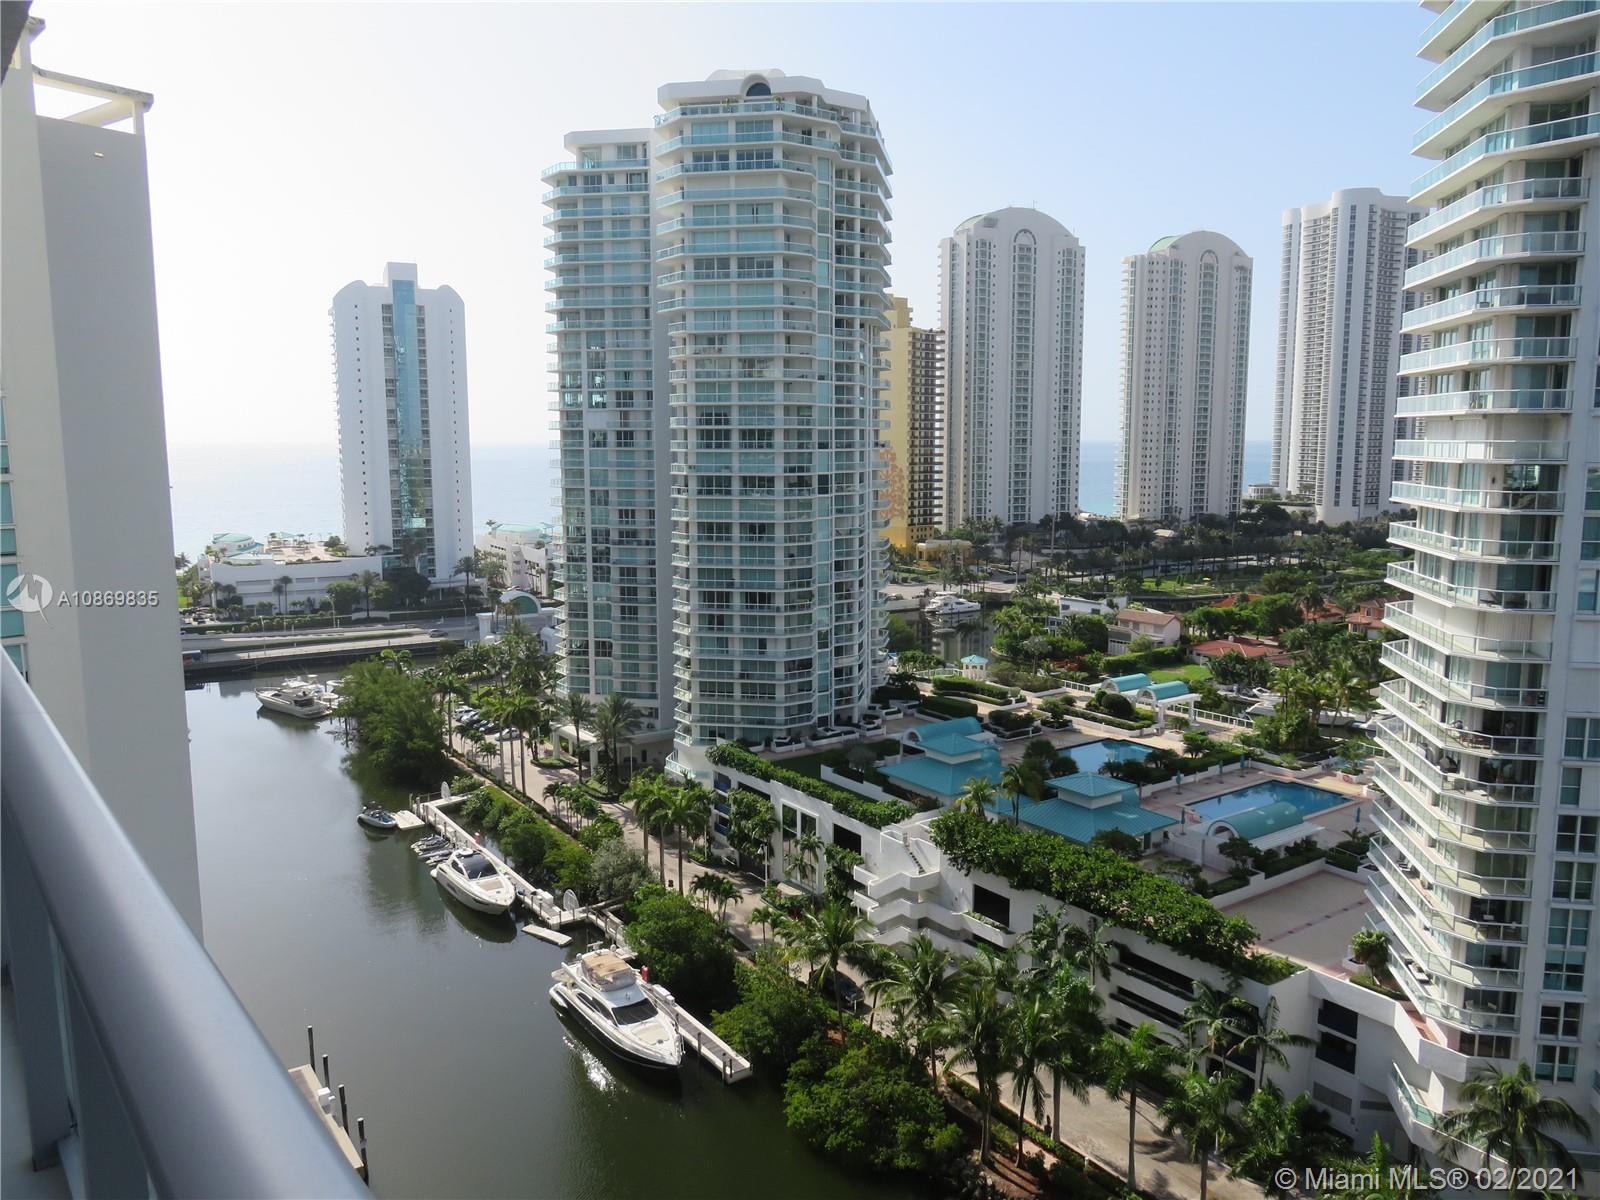 Parque Tower 1 #4-1604 - 300 Sunny Isles Blvd #4-1604, Sunny Isles Beach, FL 33160